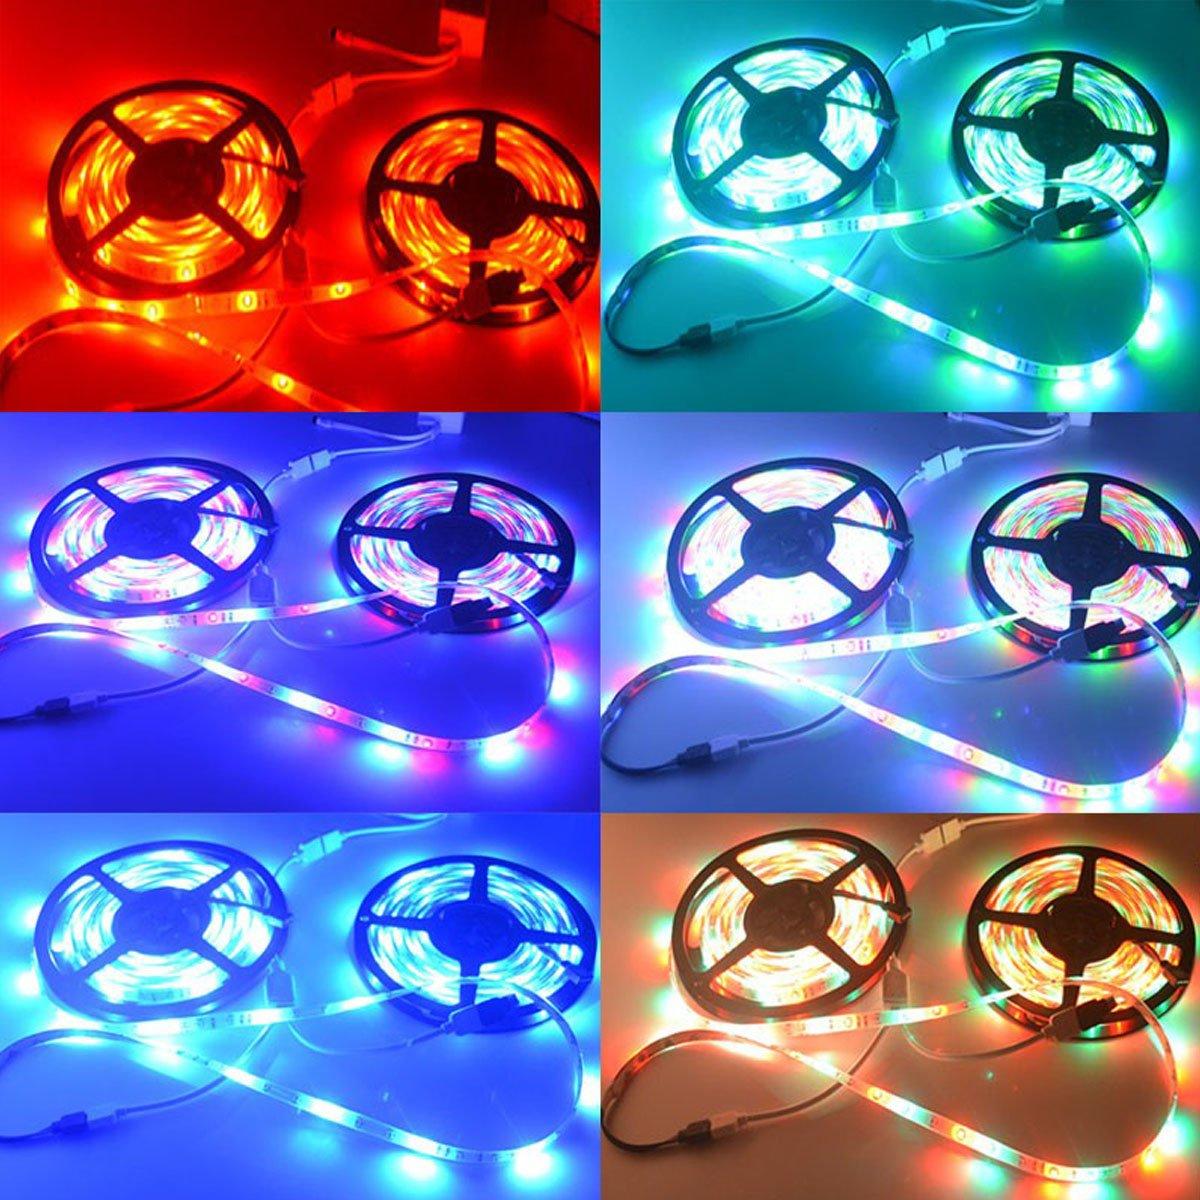 LightInTheBox 20M(45M) 5050 RGB 600 LEDs Flexible Strip Lights Not Waterproof DC 12V 600LEDs with 44Key IR Remote Controller Kit